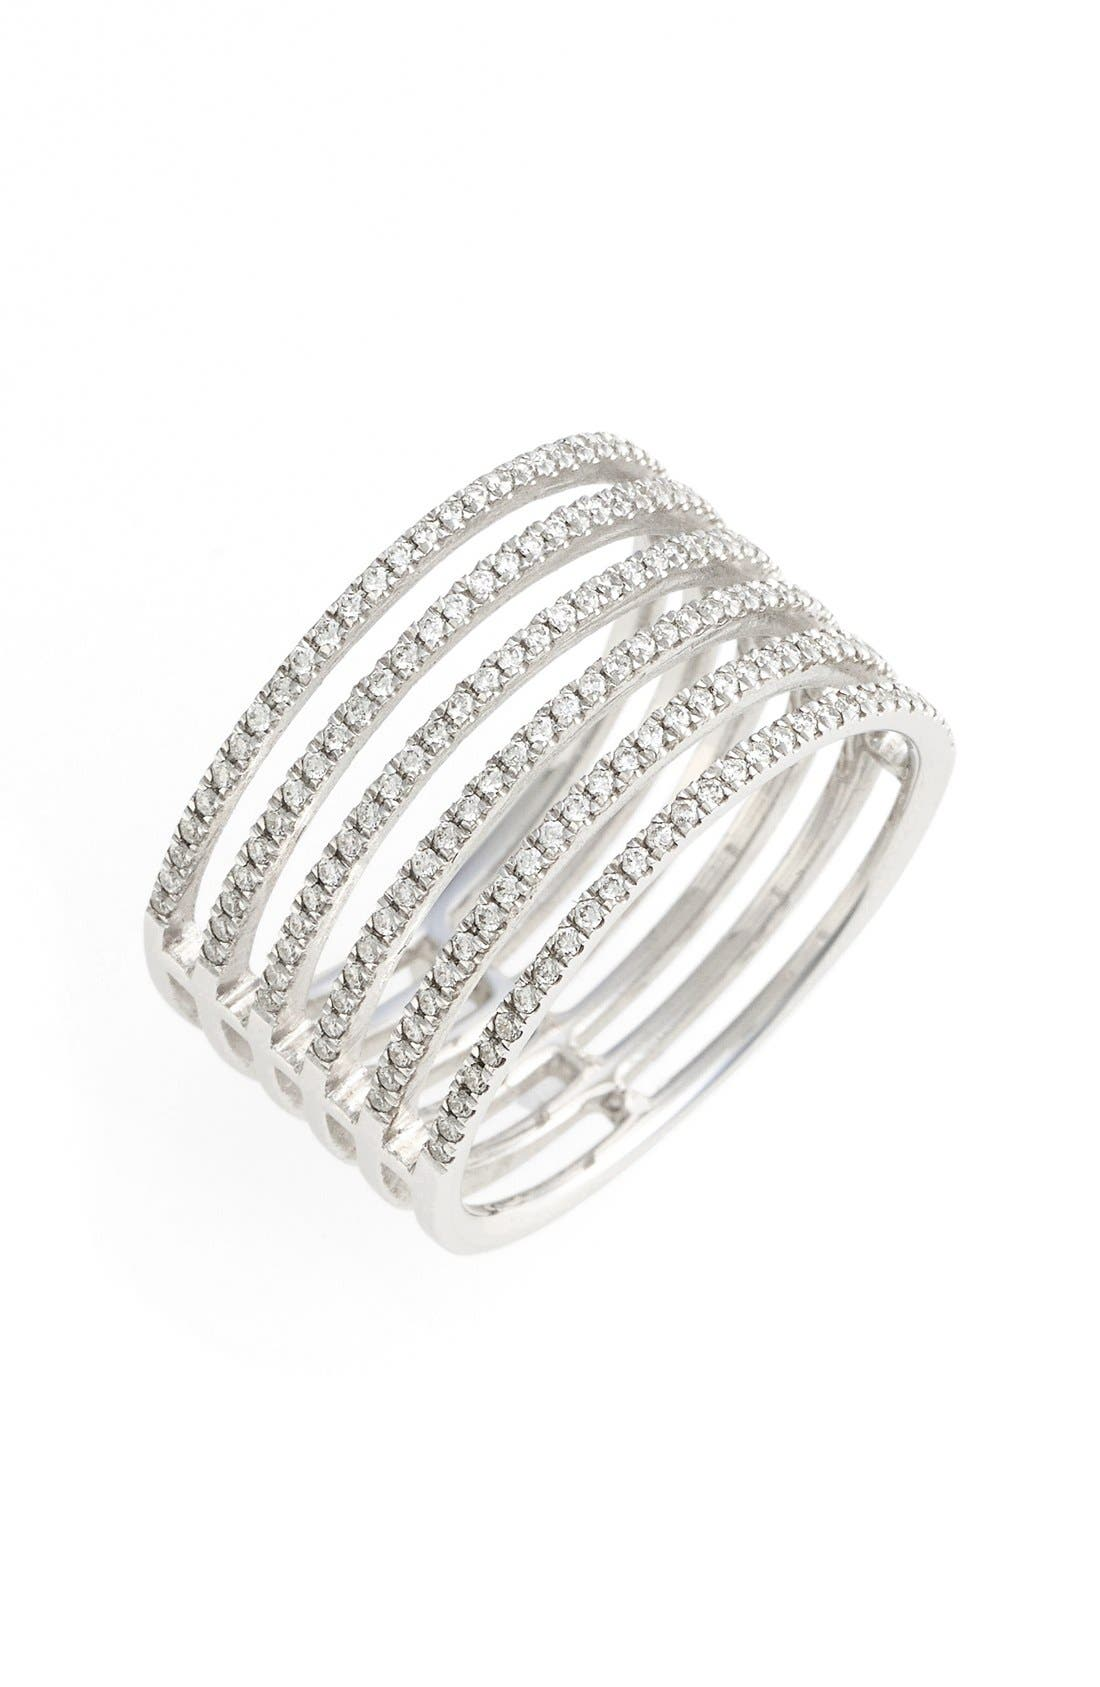 Main Image - Bony Levy 'Prism' Six-Row Diamond Ring (Nordstrom Exclusive)